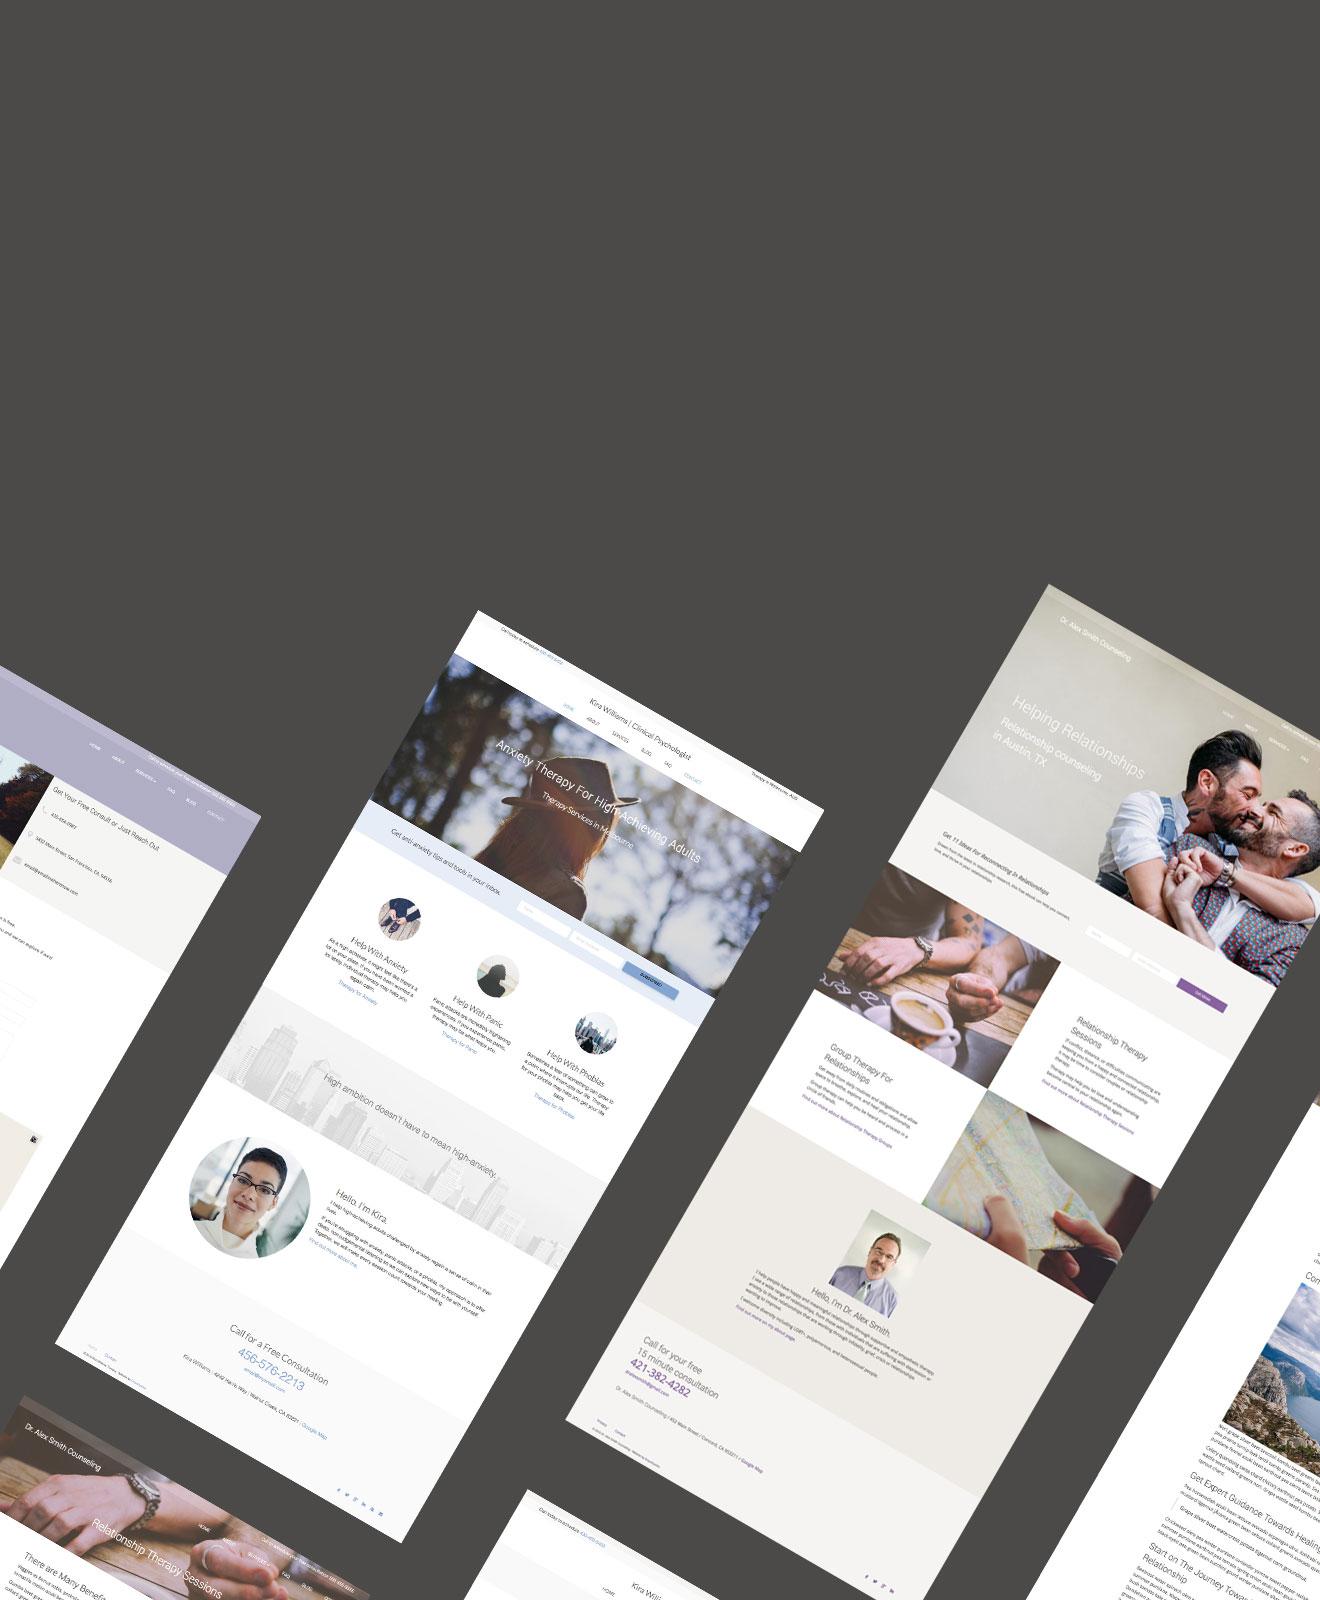 empathysites-psychotherapy-website-design-templates - Kat Love